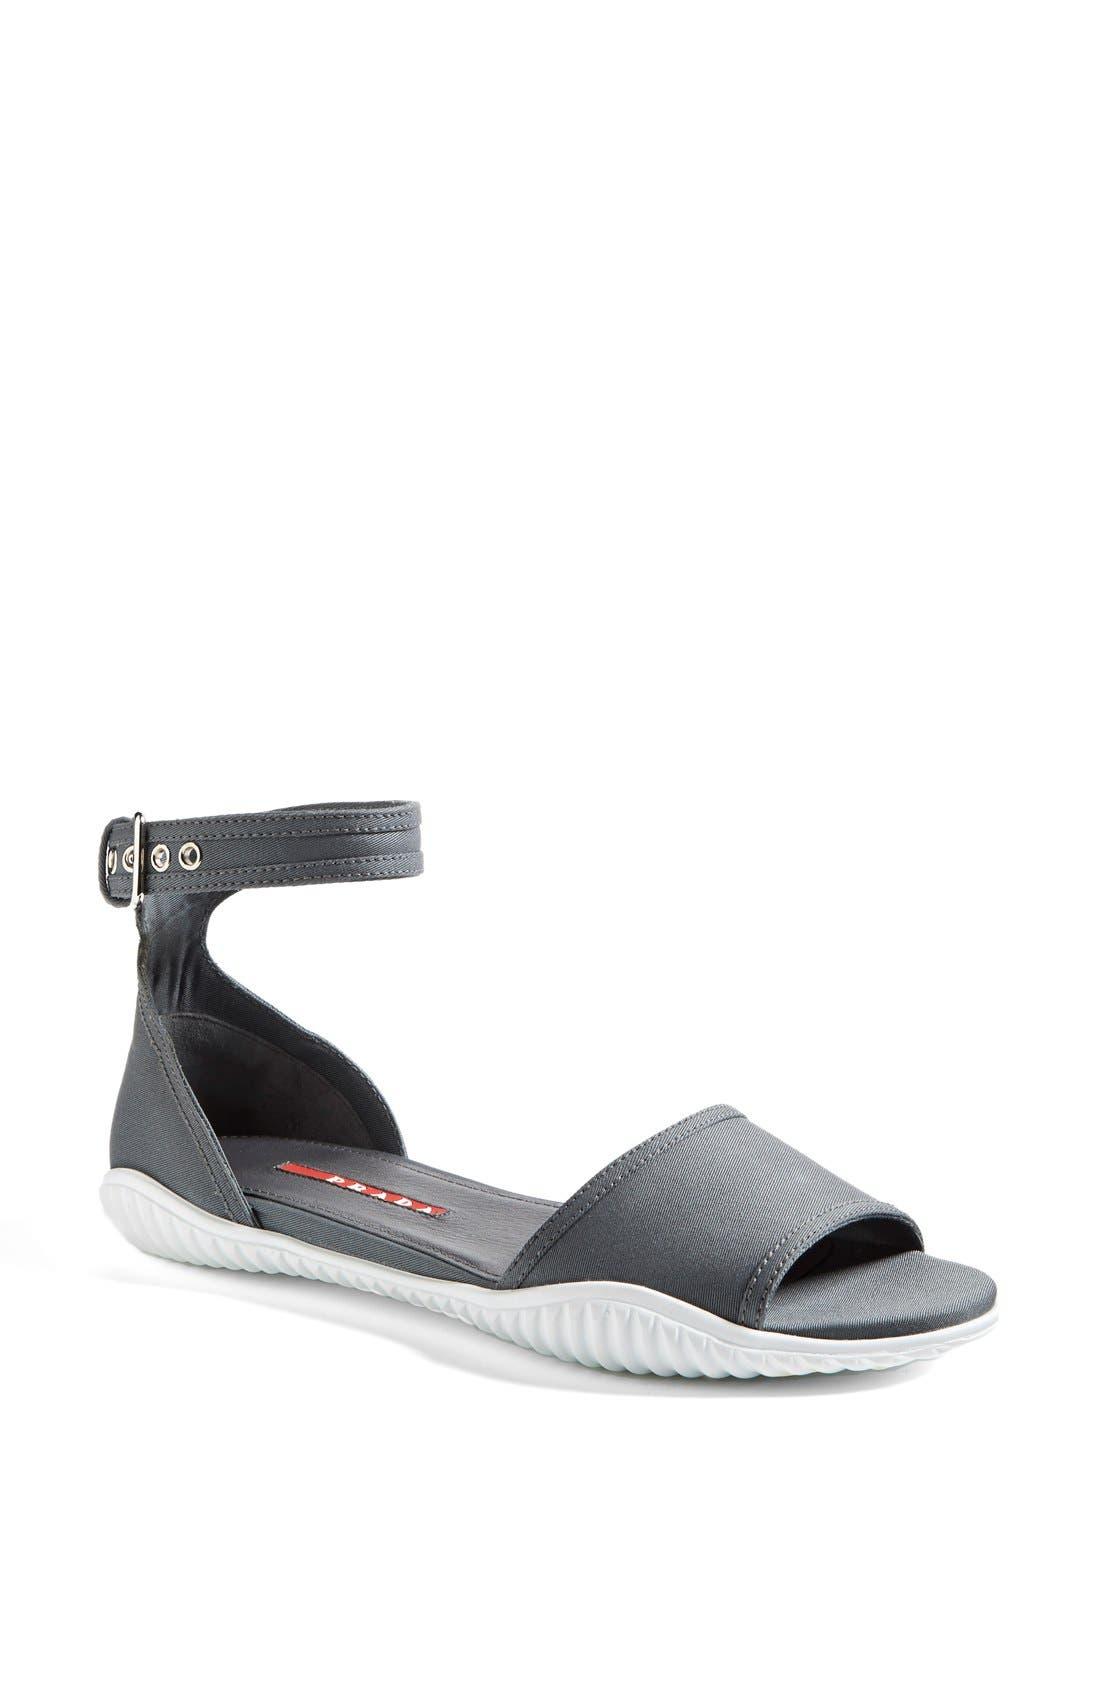 Alternate Image 1 Selected - Prada Ankle Strap Sport Sandal